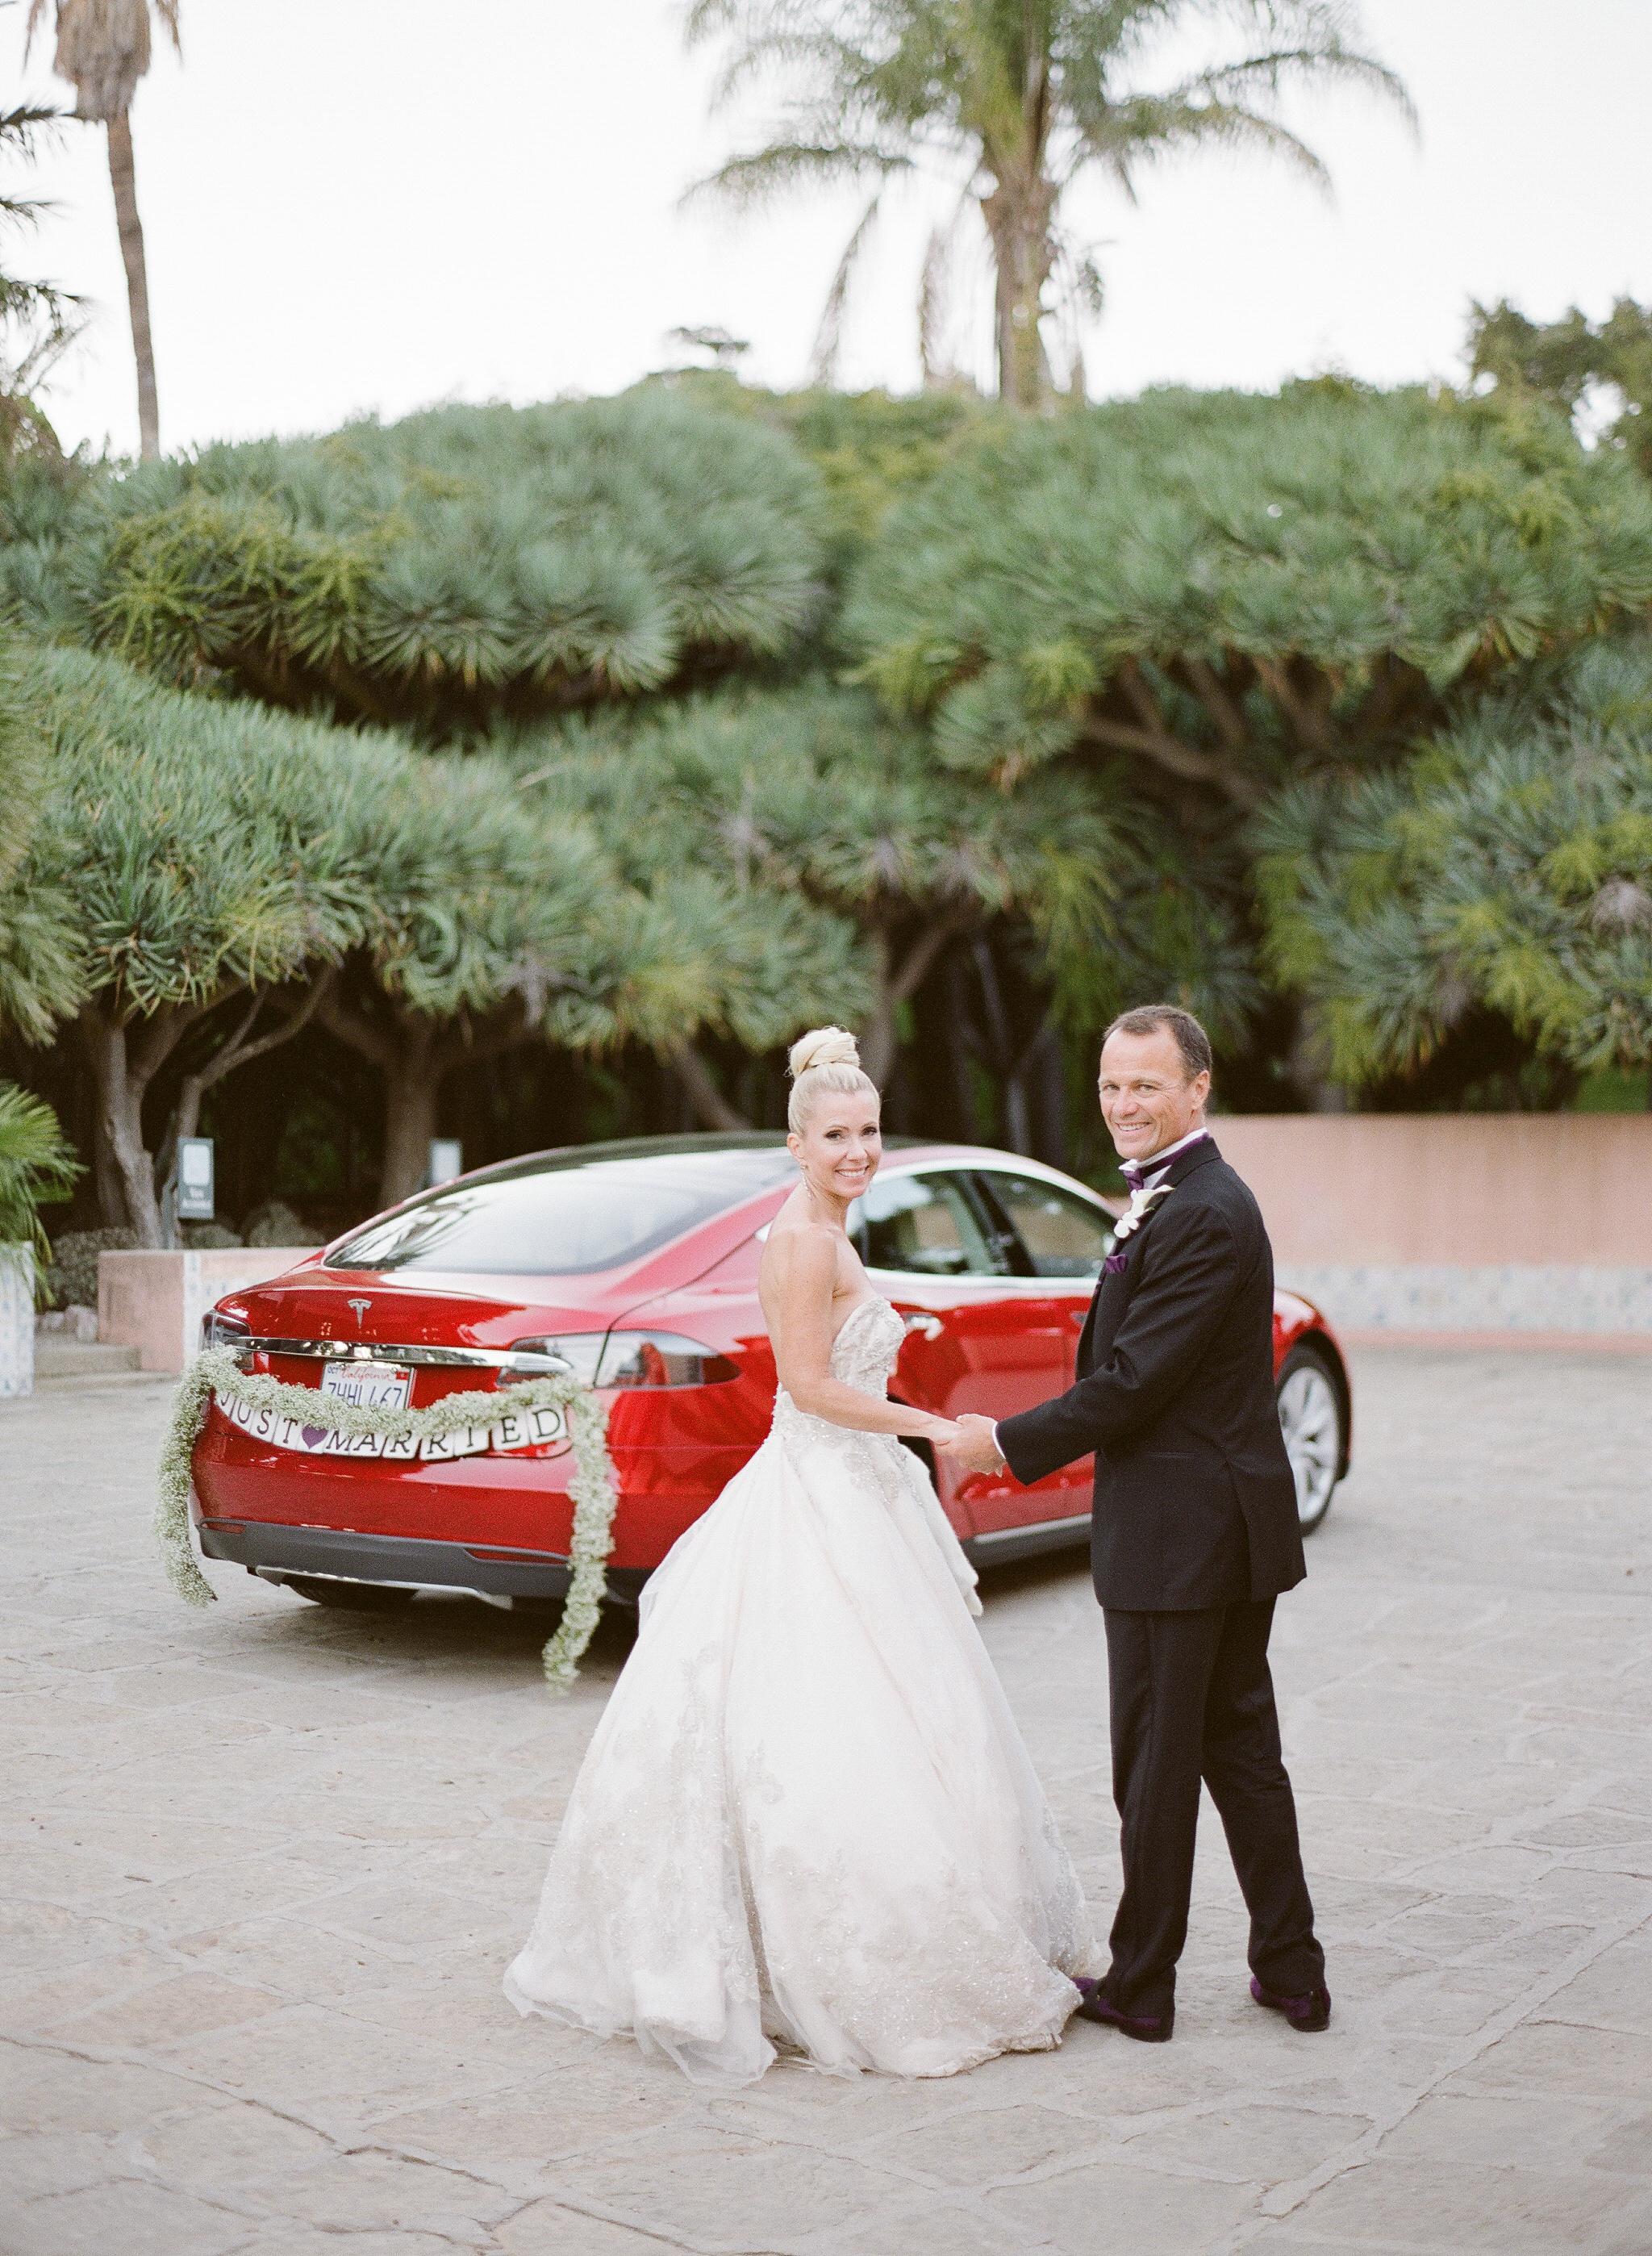 www.SantaBarbarawedding.com | Merryl Brown Events | Lotus Land| Wedding Location | Private Garden Venue